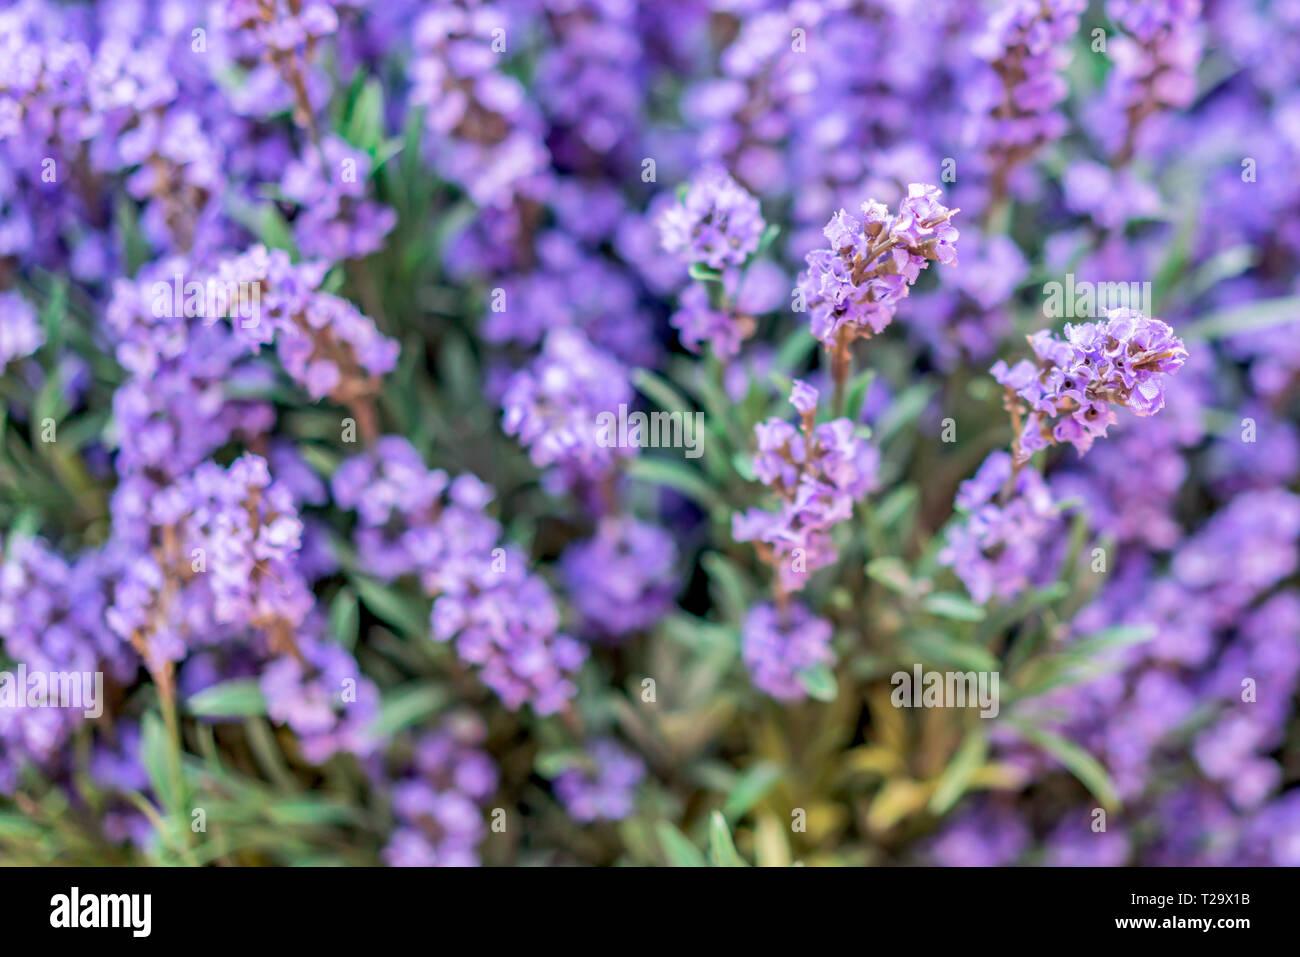 Violeta lavanda decorativo cerca de fondo texturado Imagen De Stock